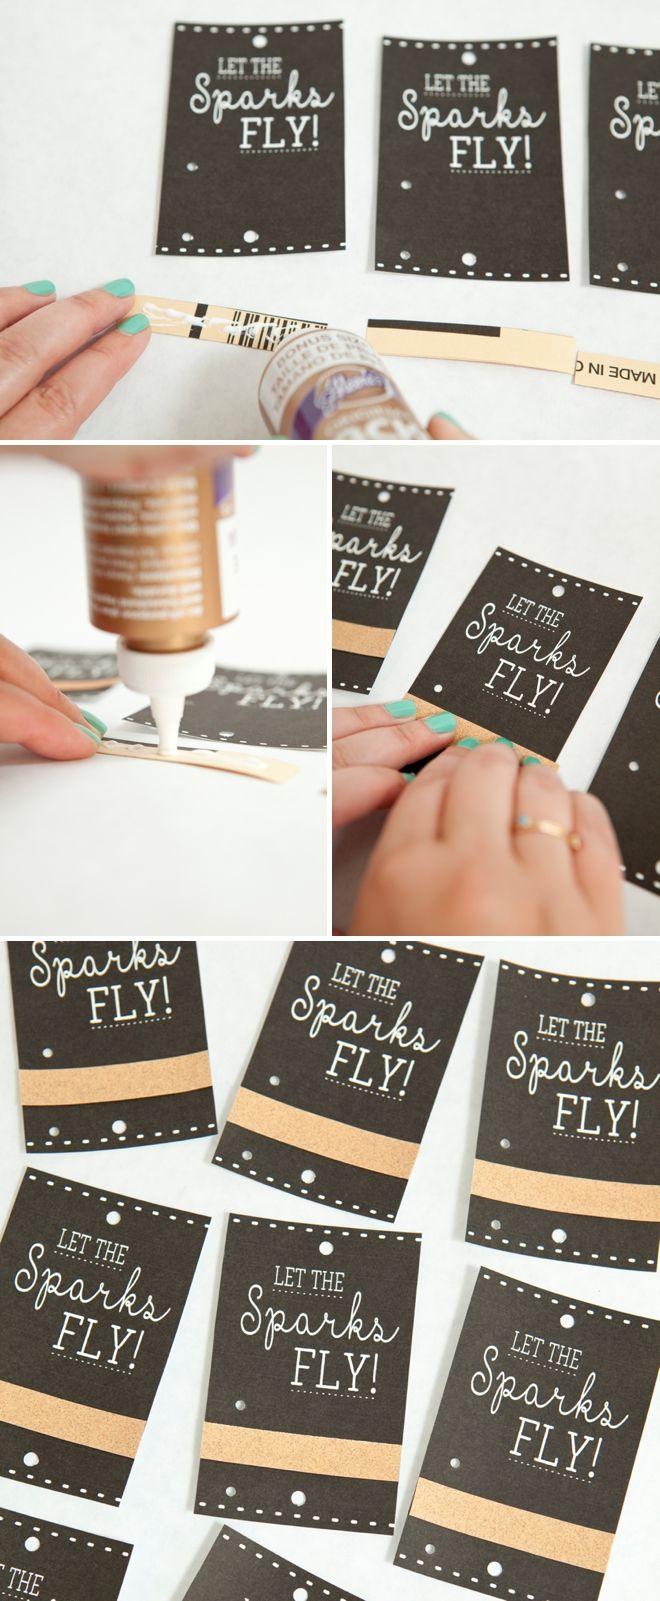 Make These Adorable Wedding Sparkler Tags + Sign For Free! | Kiera's - Free Printable Wedding Sparkler Sign